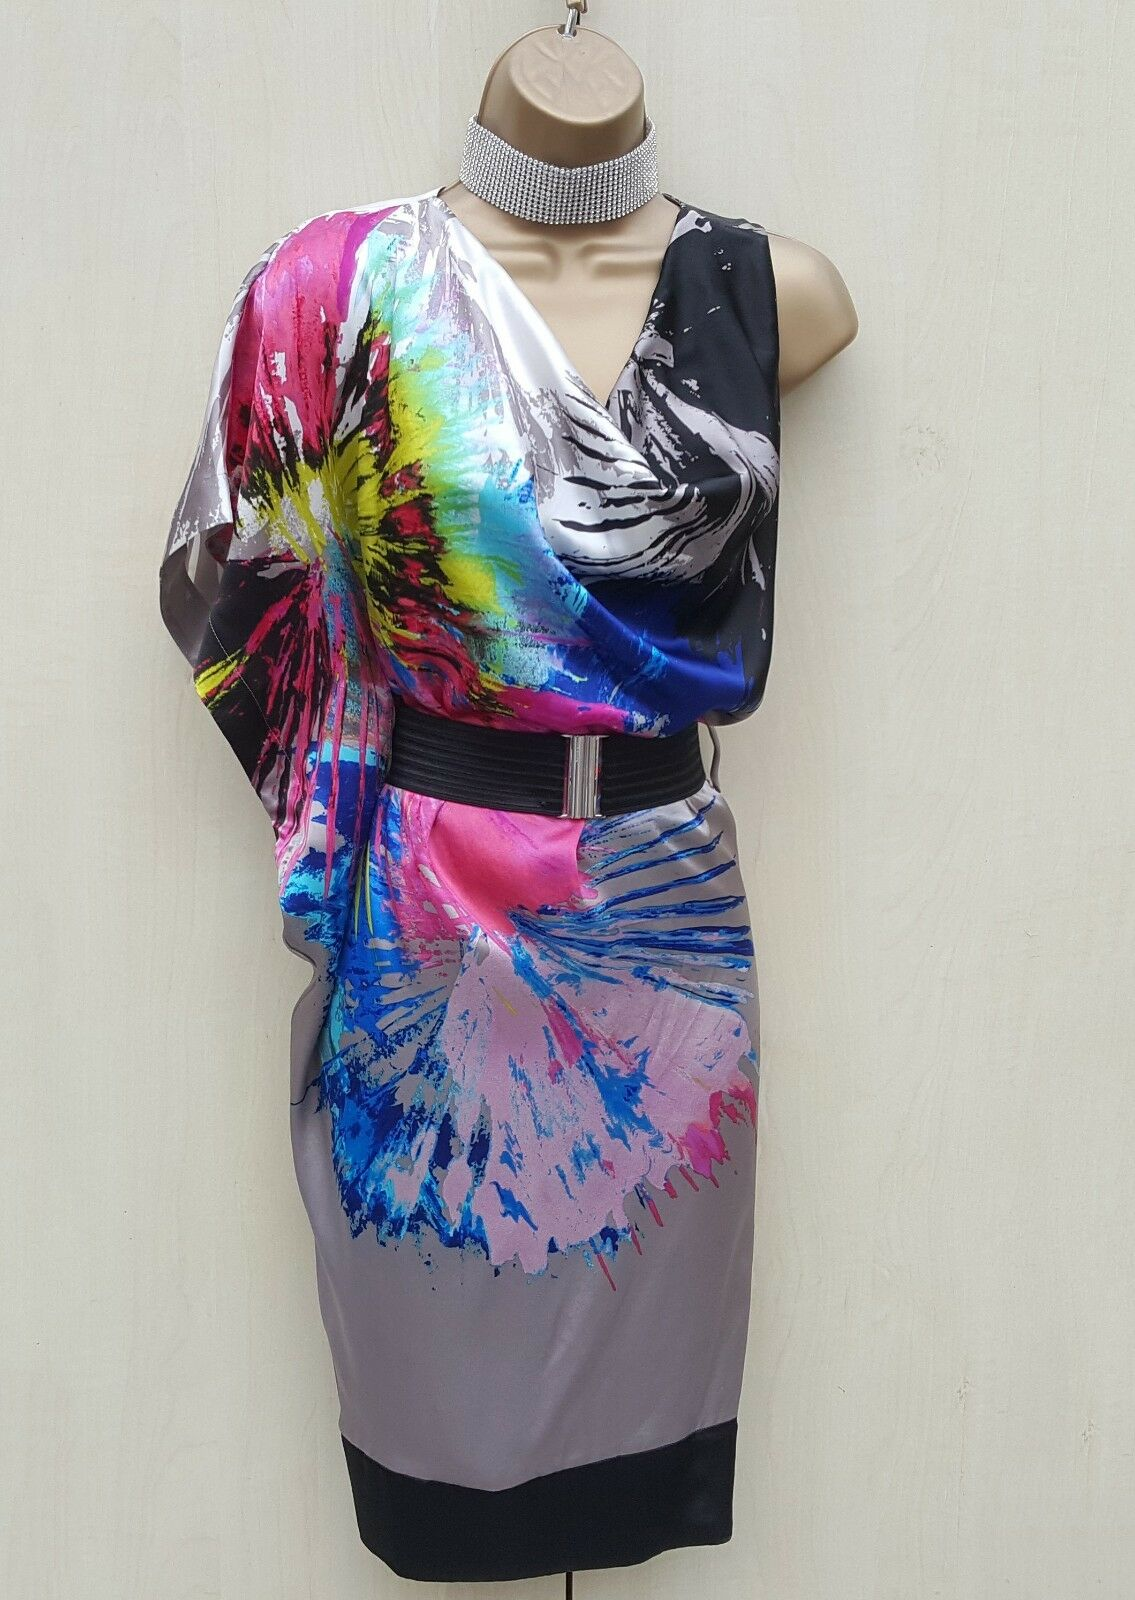 NEW Größe 6 UK STUNNING KAREN MILLEN SILK PRINTED DRAPED KIMONO PARTY DRESS